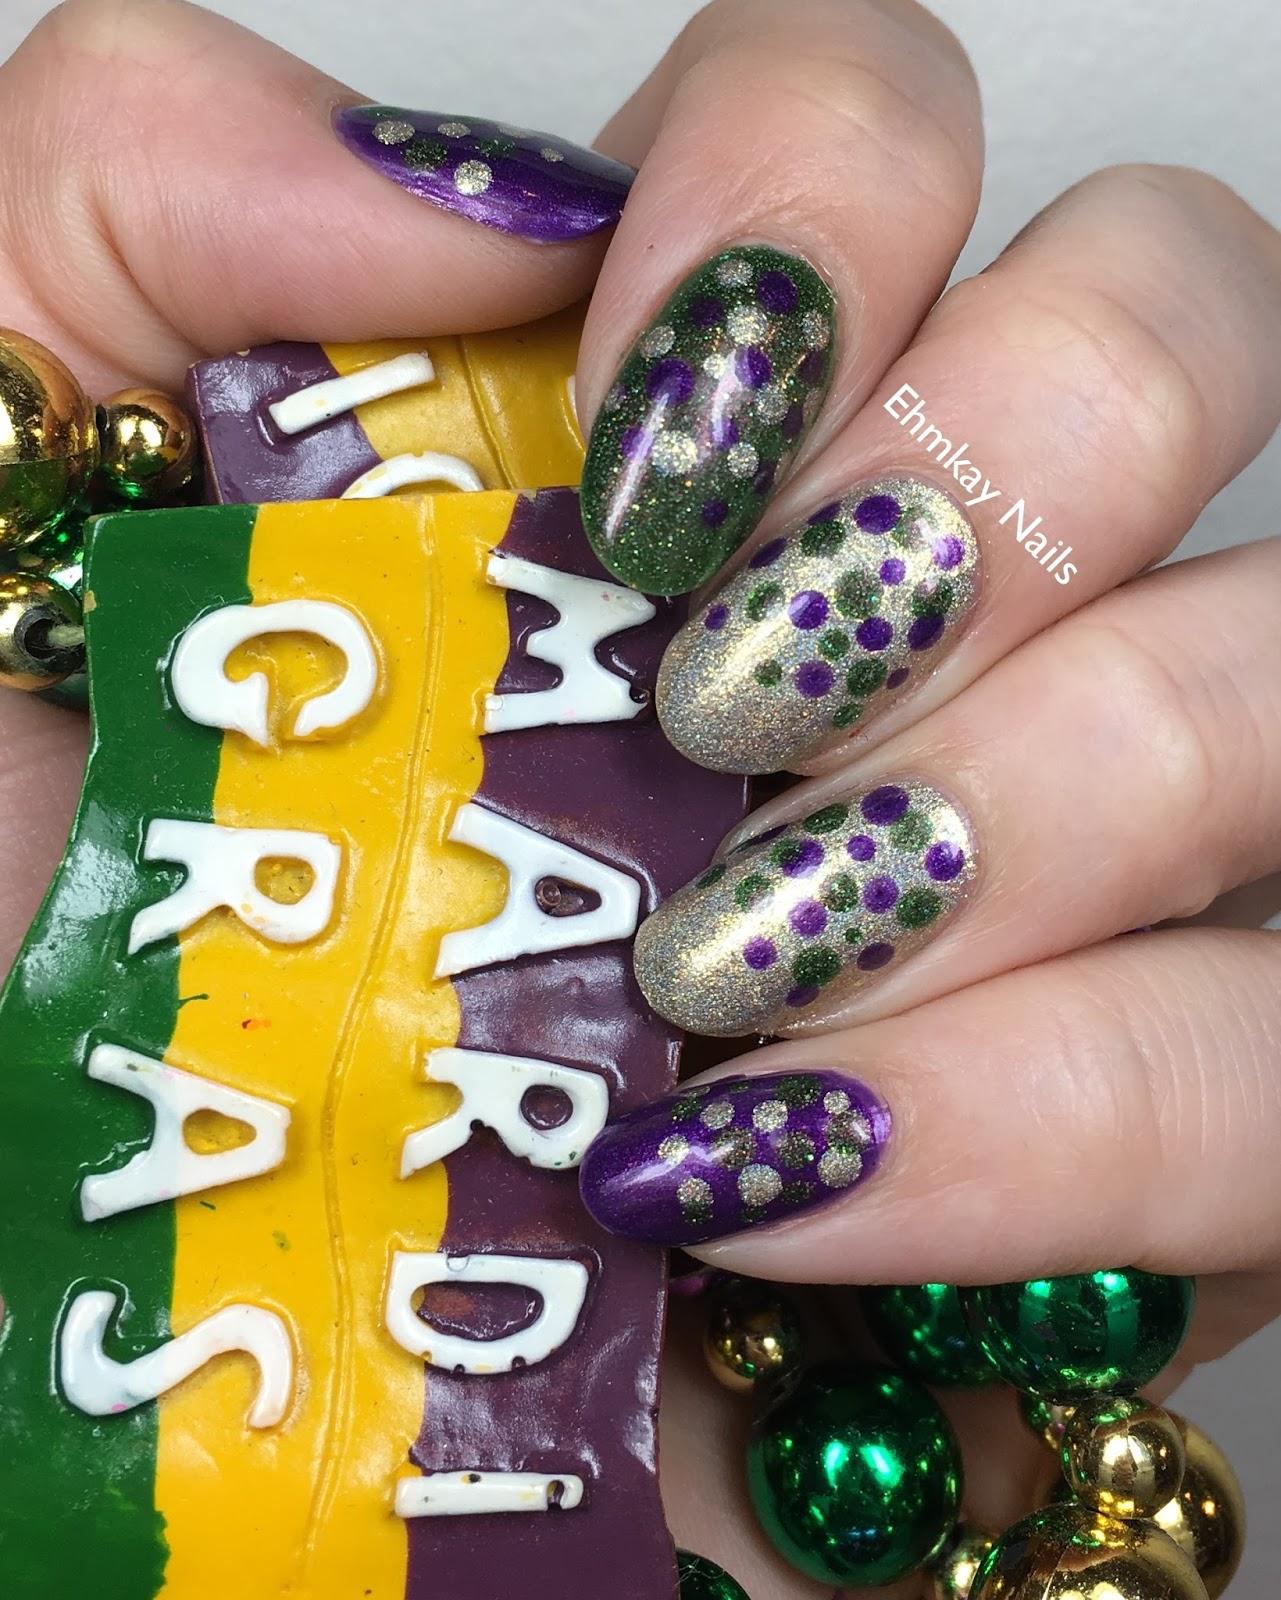 ehmkay nails: Mardi Gras Nail Art with Girly Bits